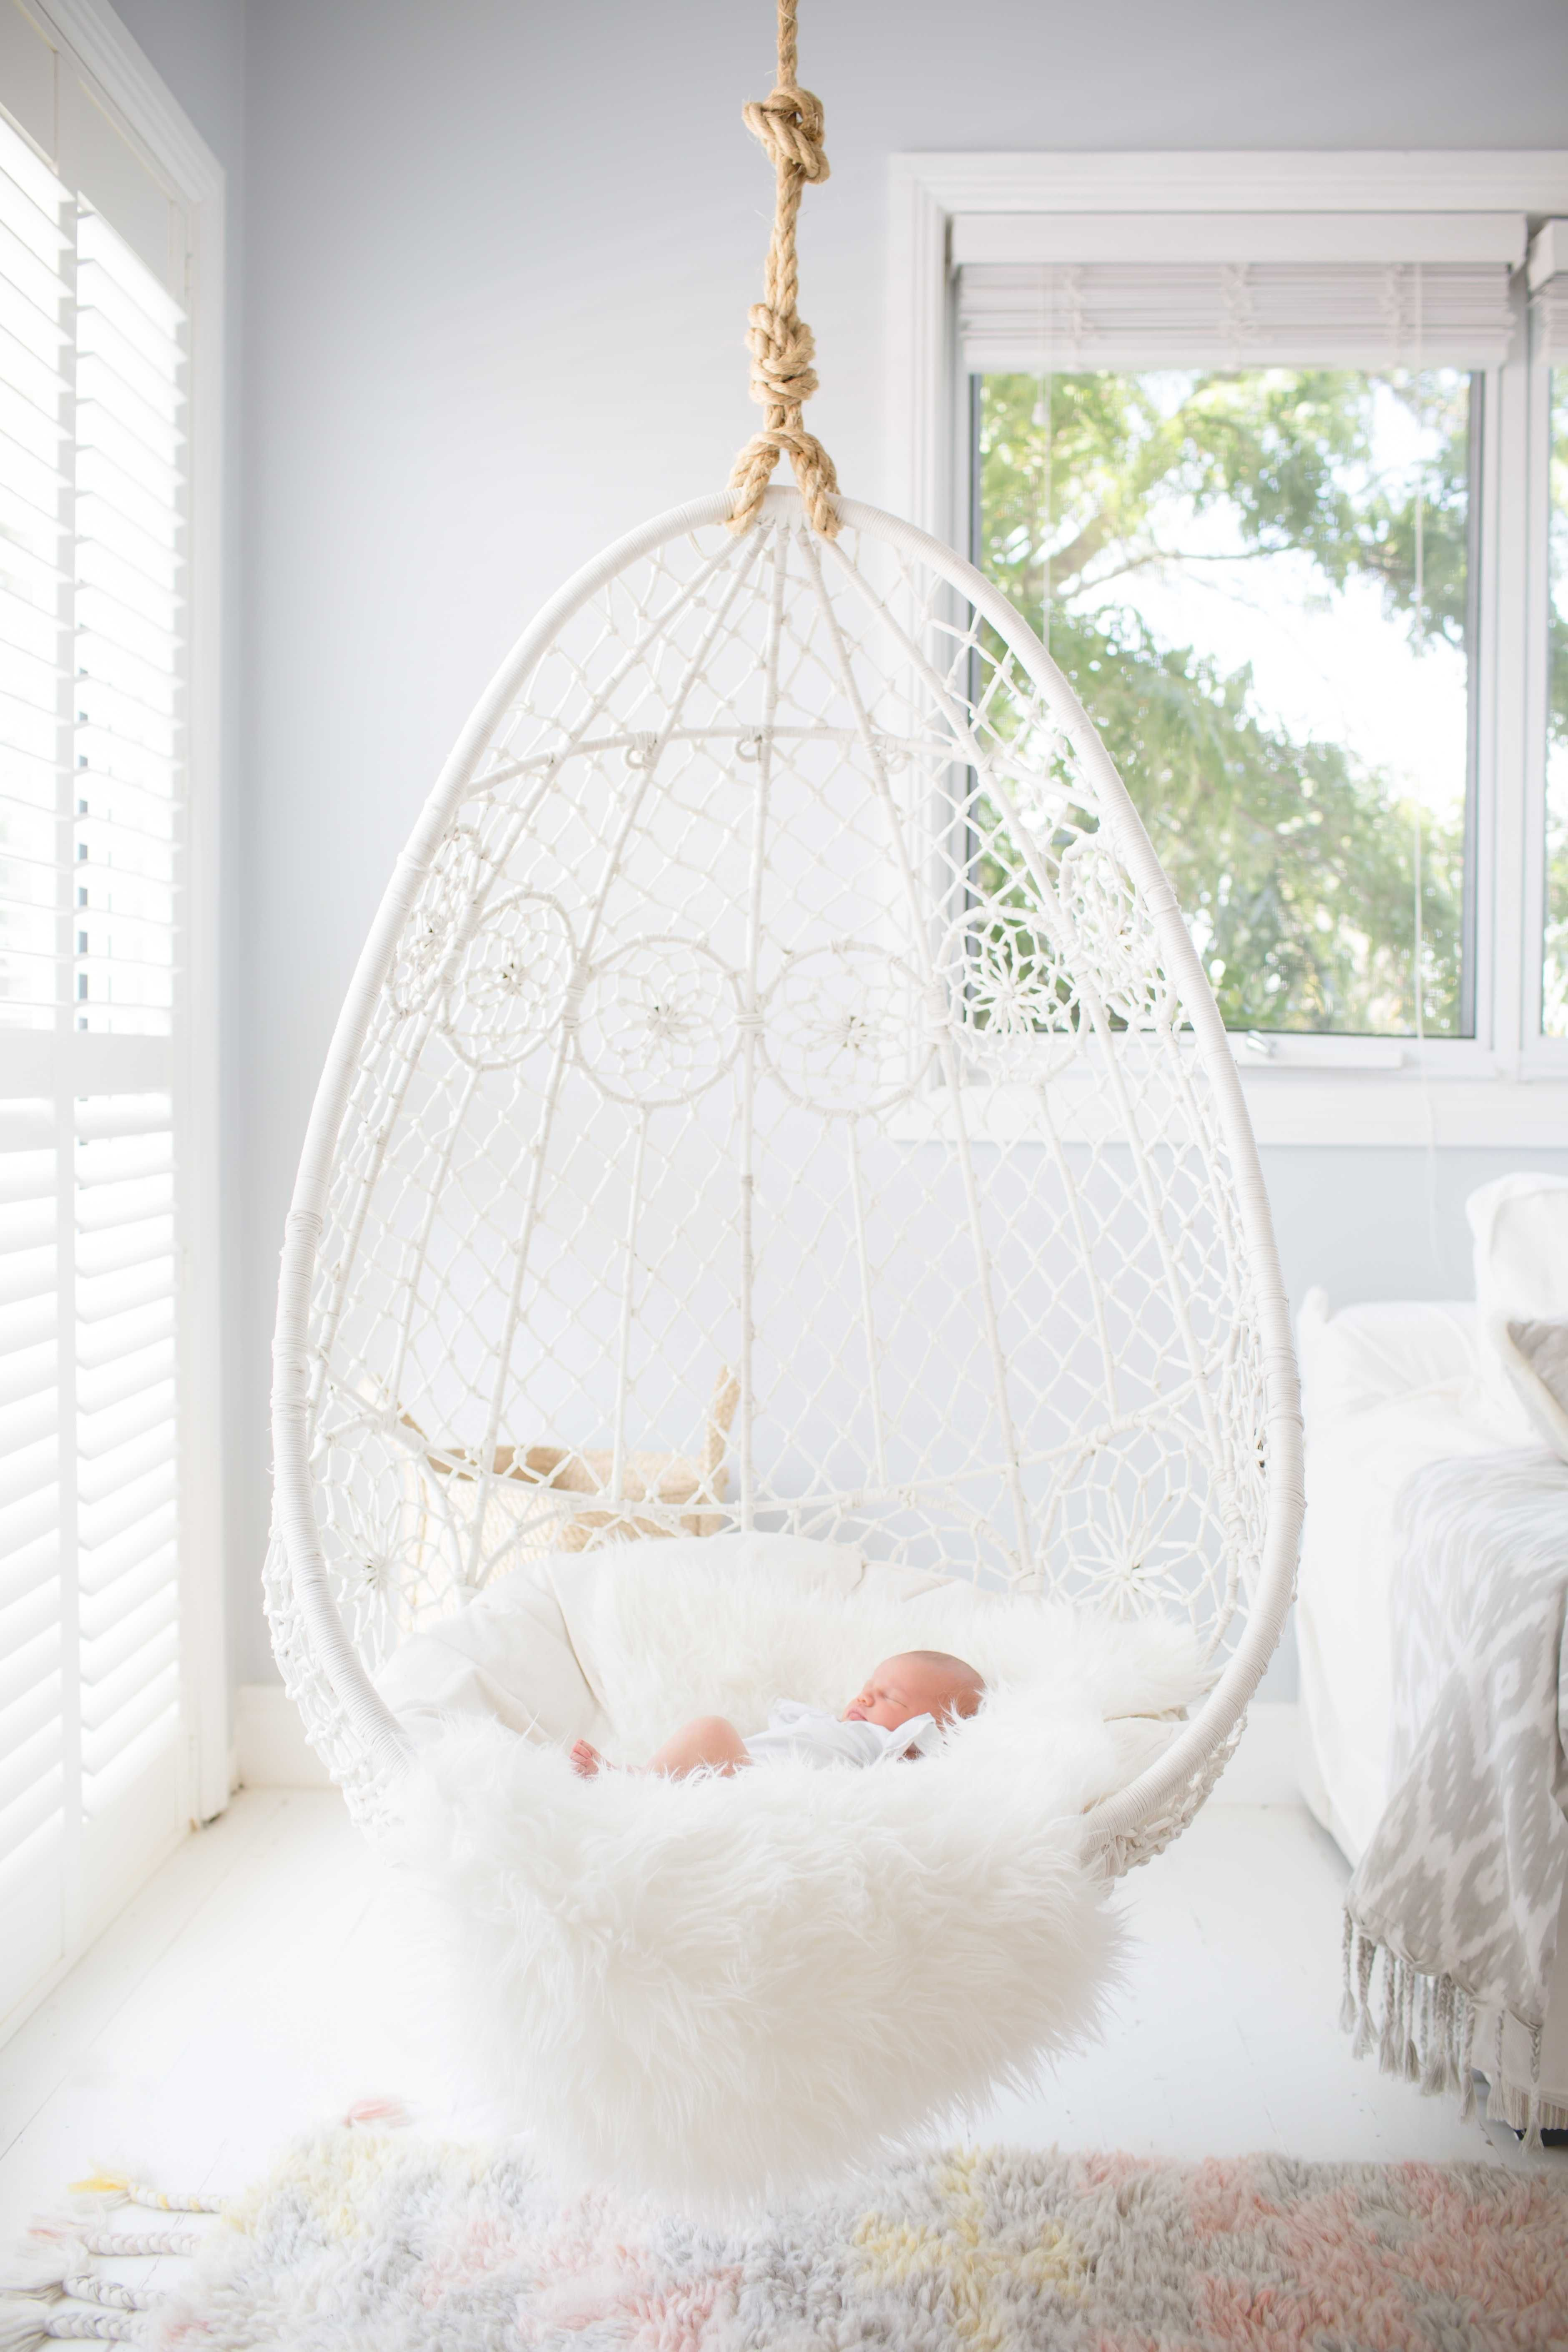 genial hanging egg stuhl fr schlafzimmer - hanging egg stuhl